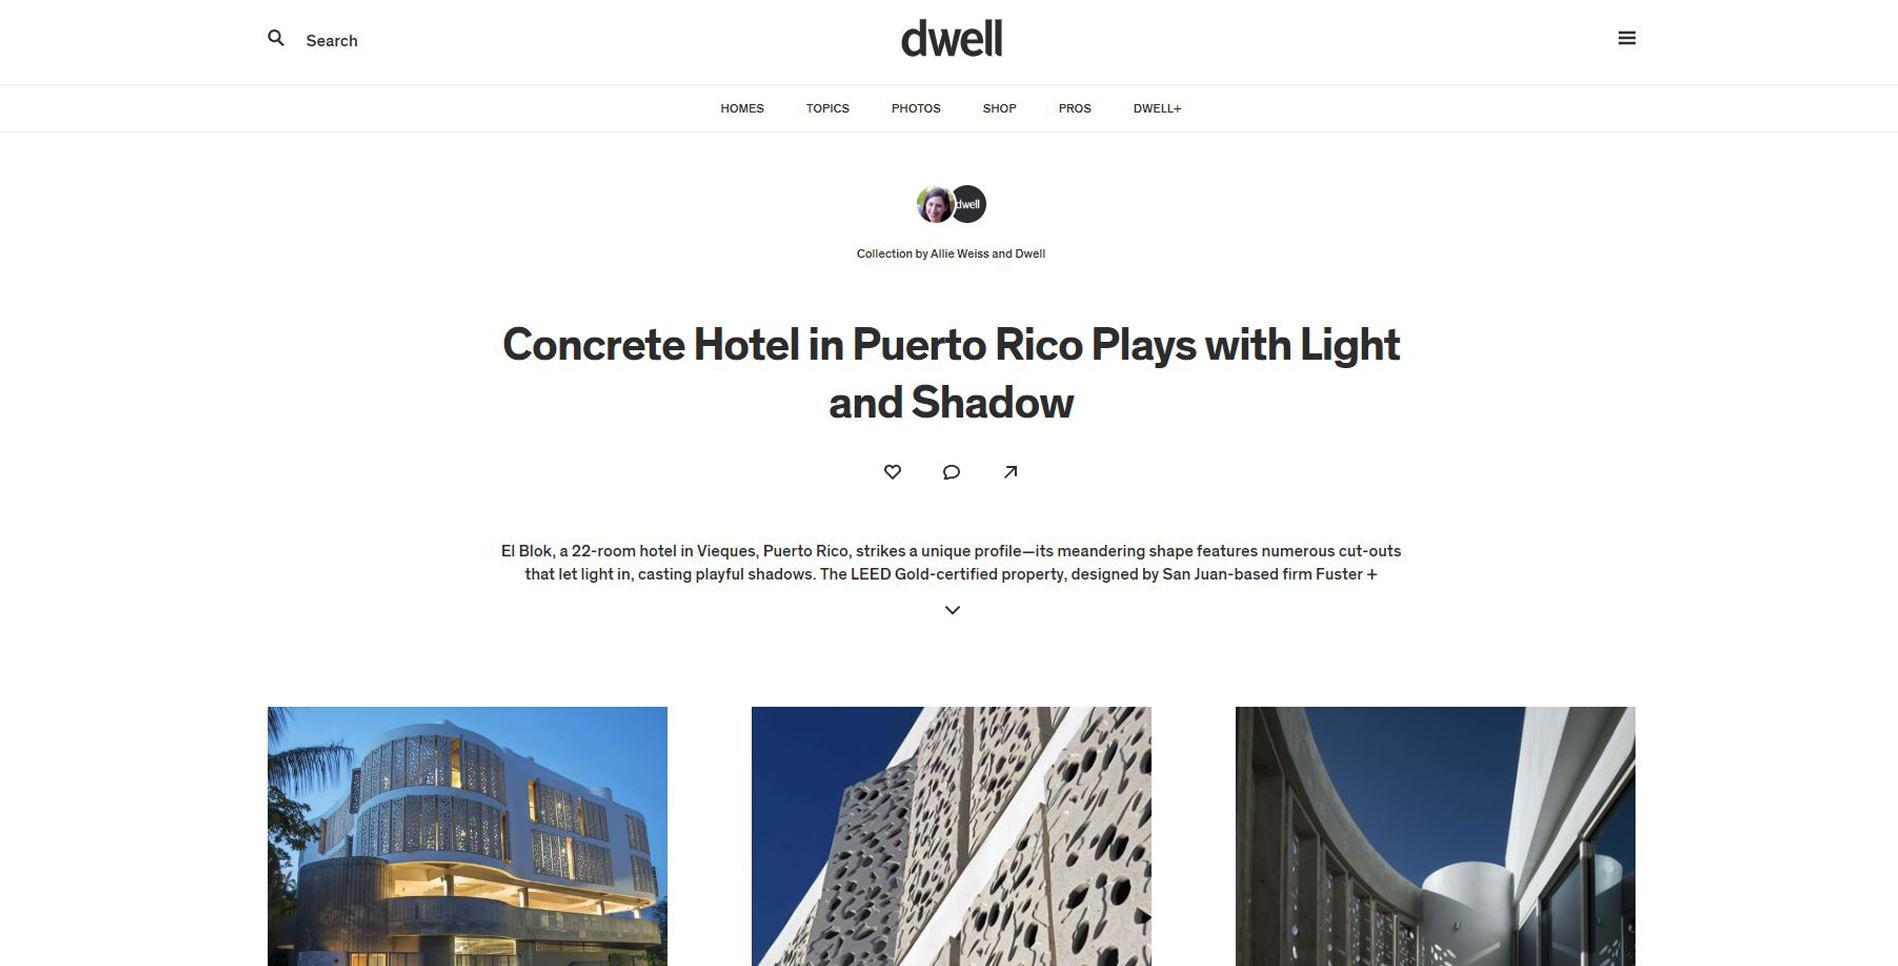 20. Dwell (El Blok).JPG